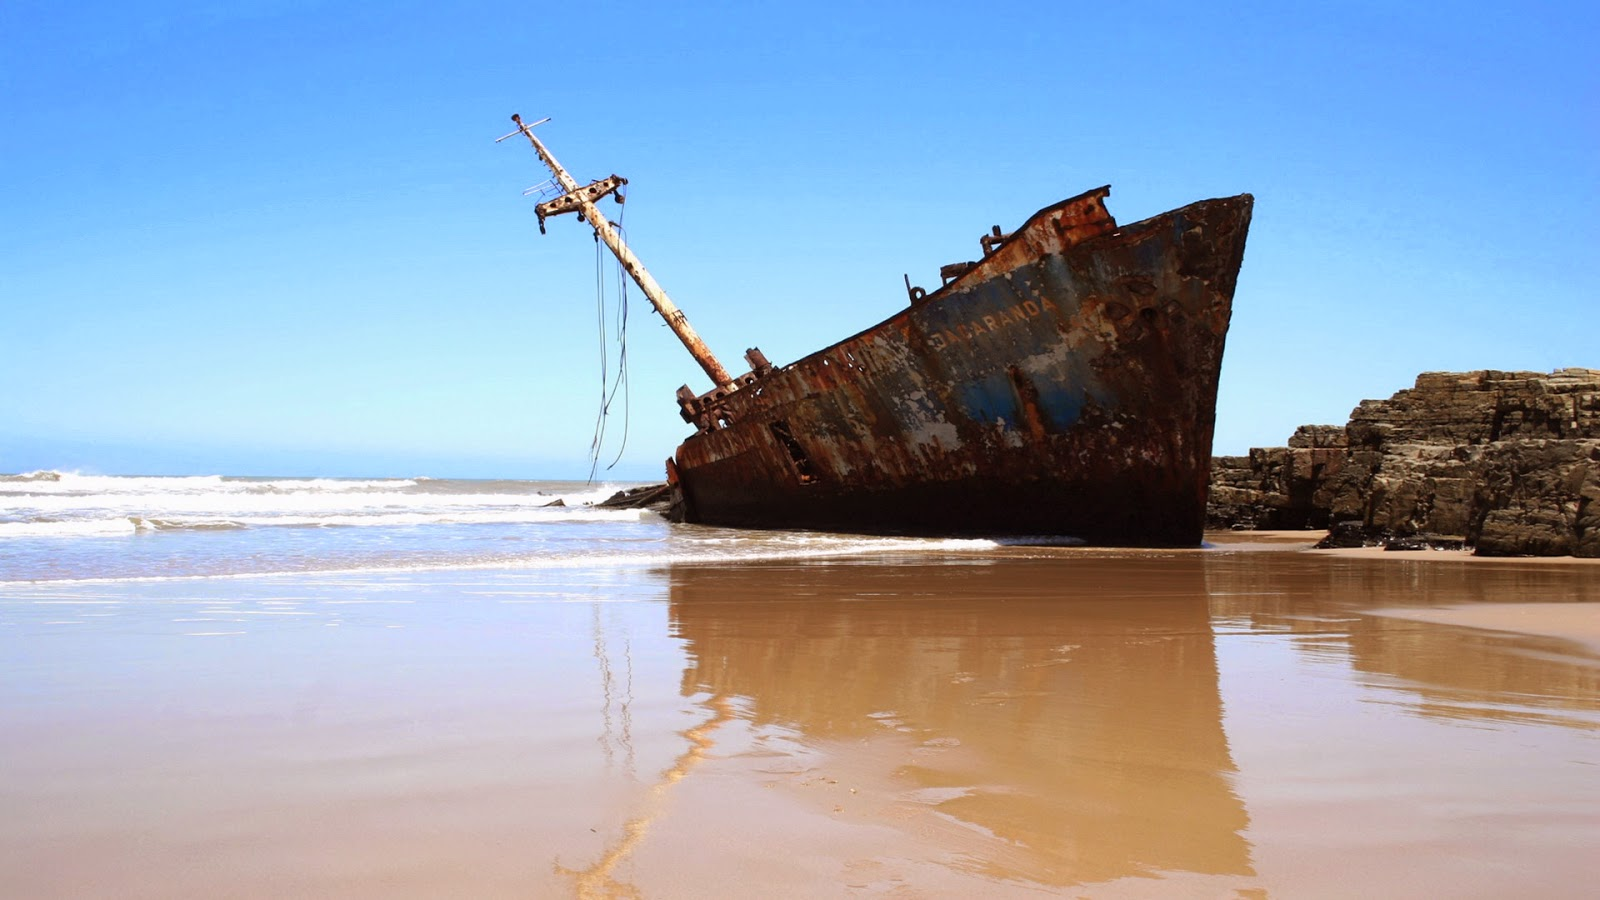 old-sunken-ship-on-sea-beach-wallpaper-for-desktop-pc-mac.jpg